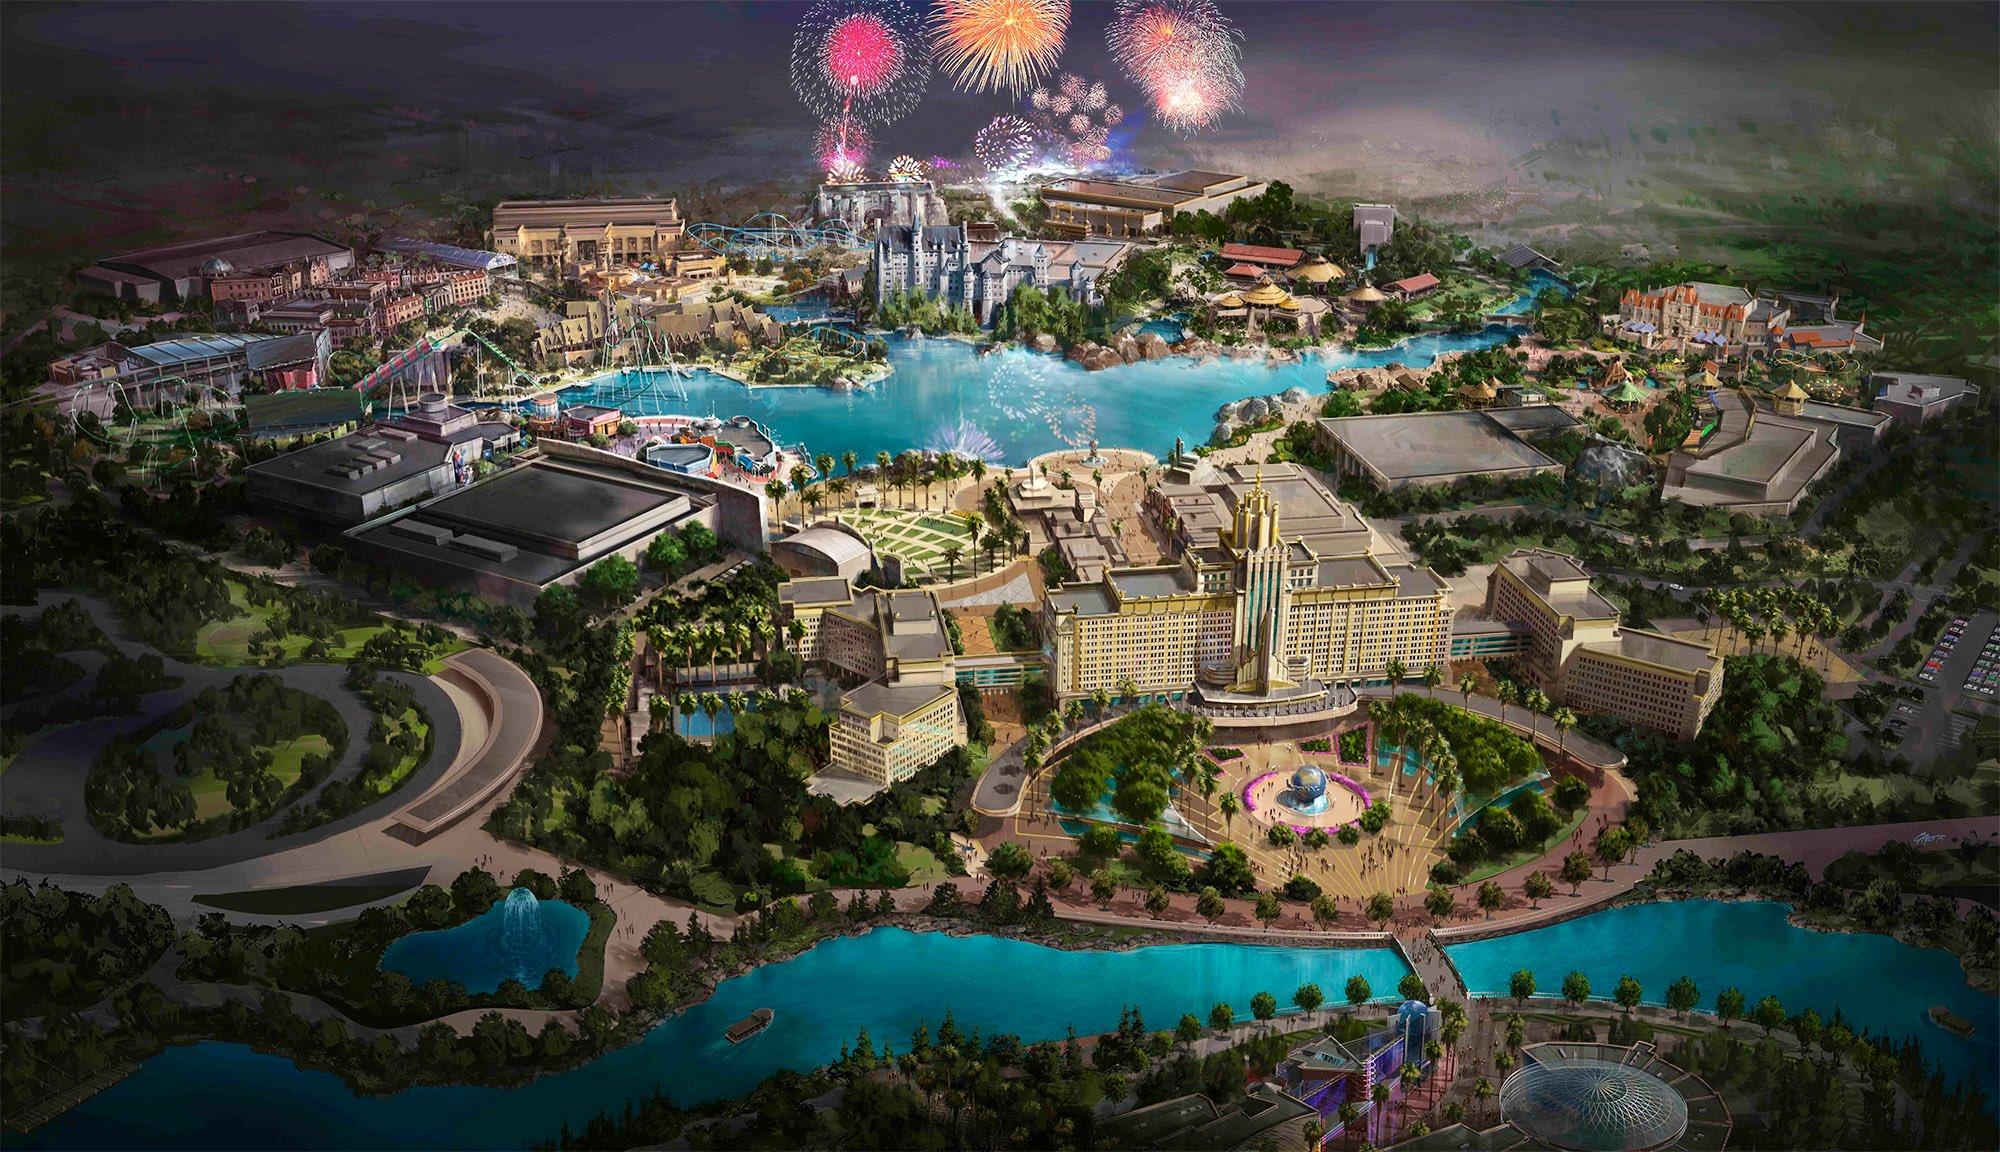 Parque Temático Universal Studios de Pekín